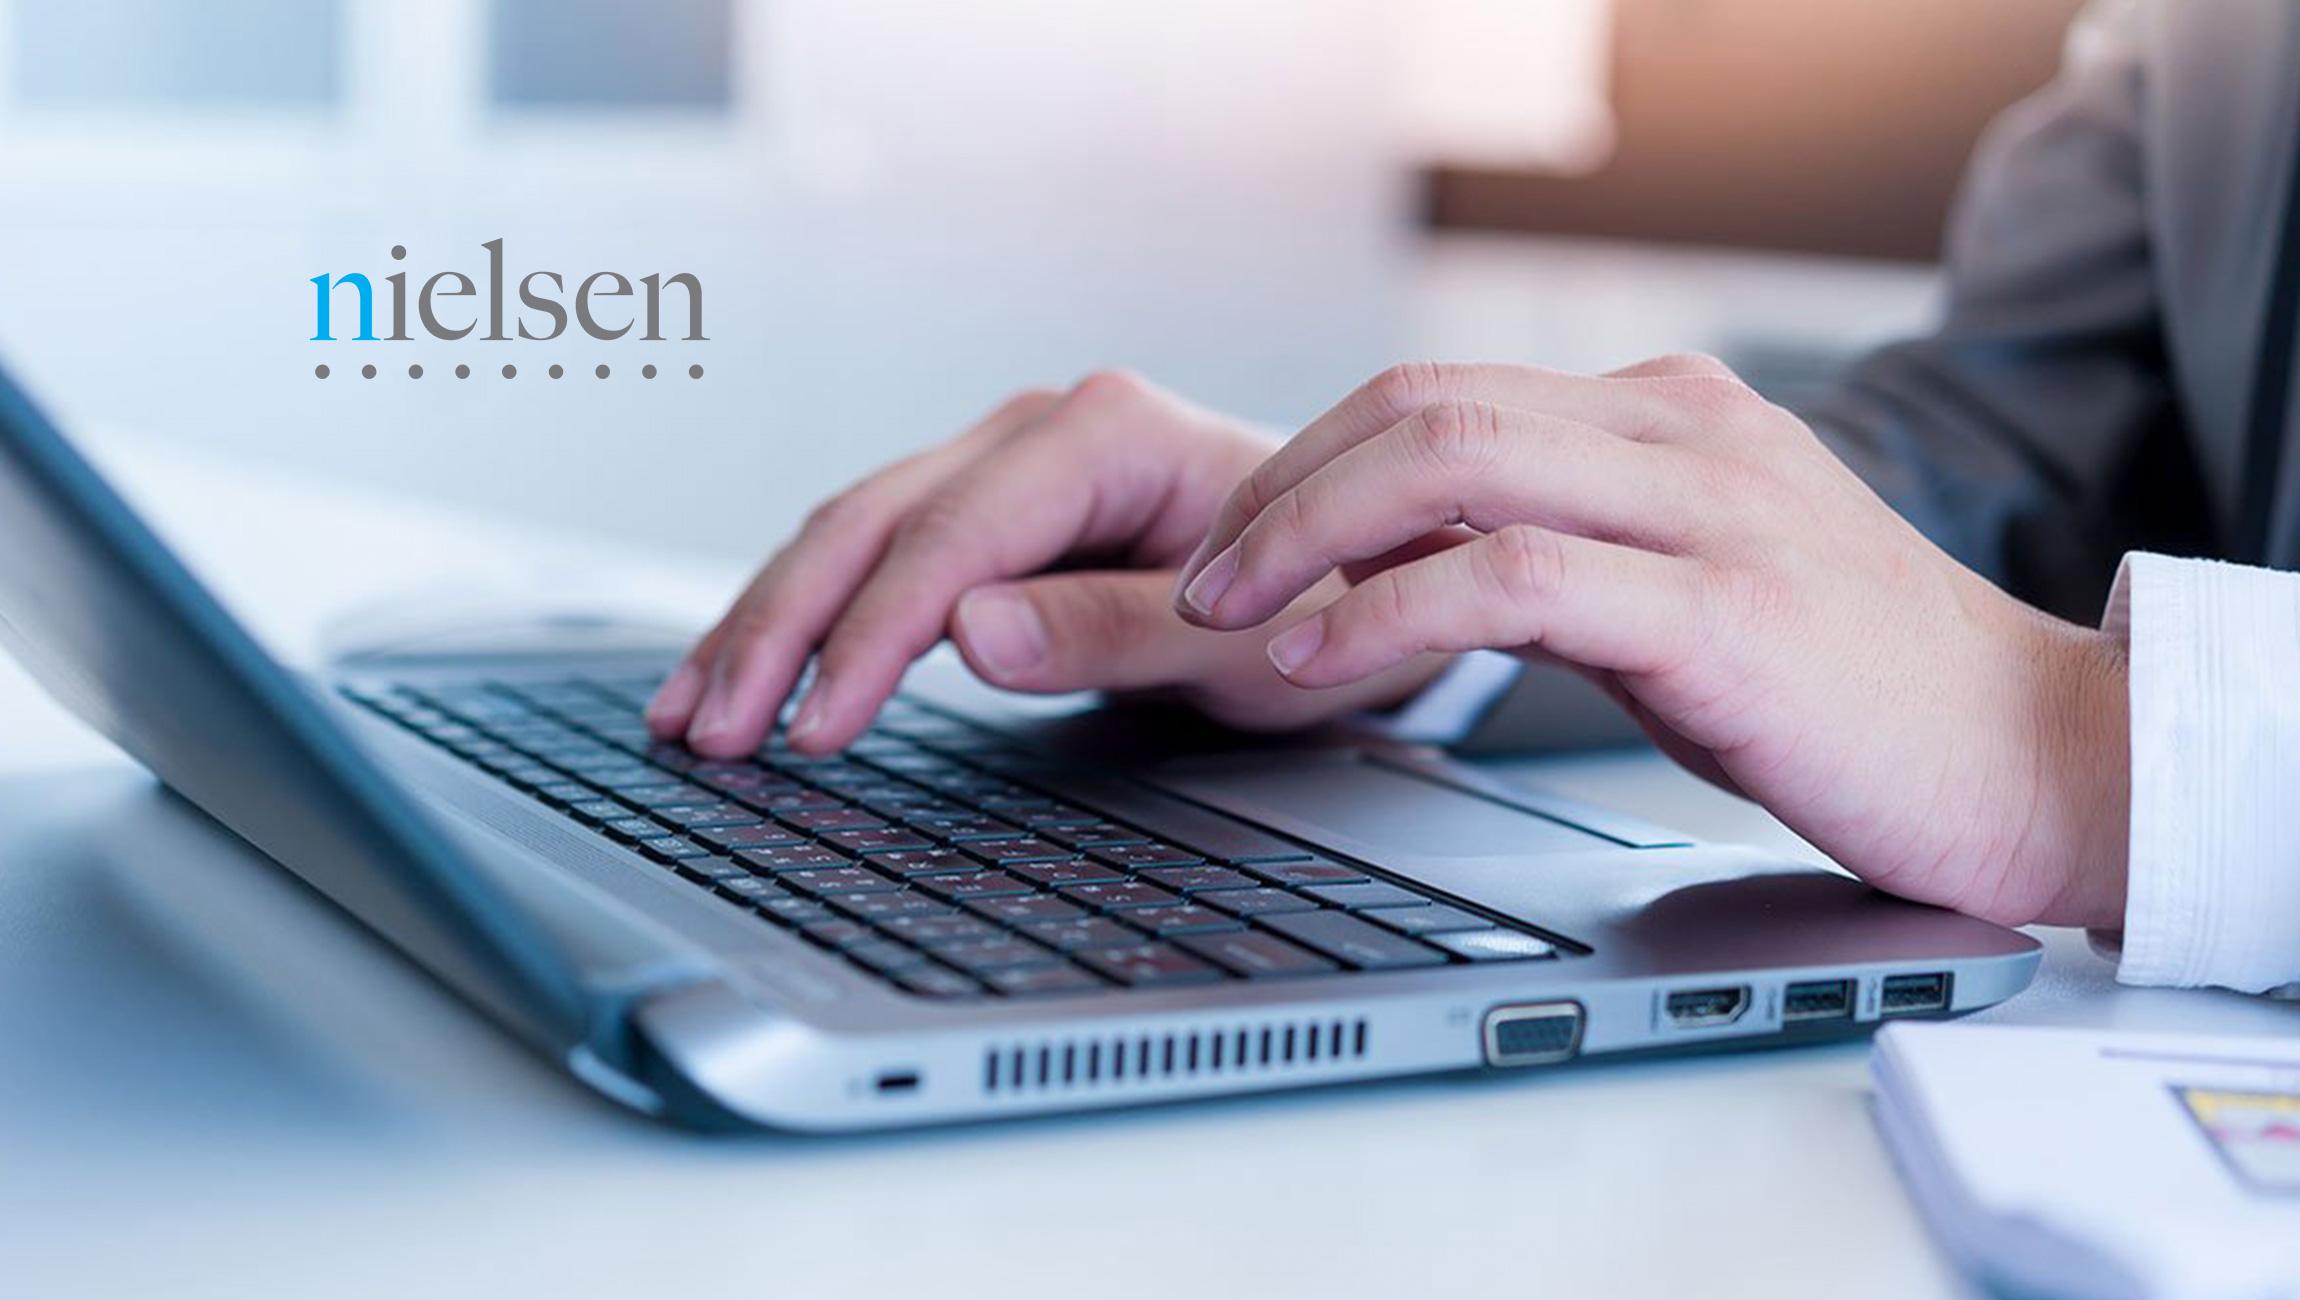 Nielsen Expands Connect Partner Network, Industry's Most Open, Tech-Driven Partner Ecosystem